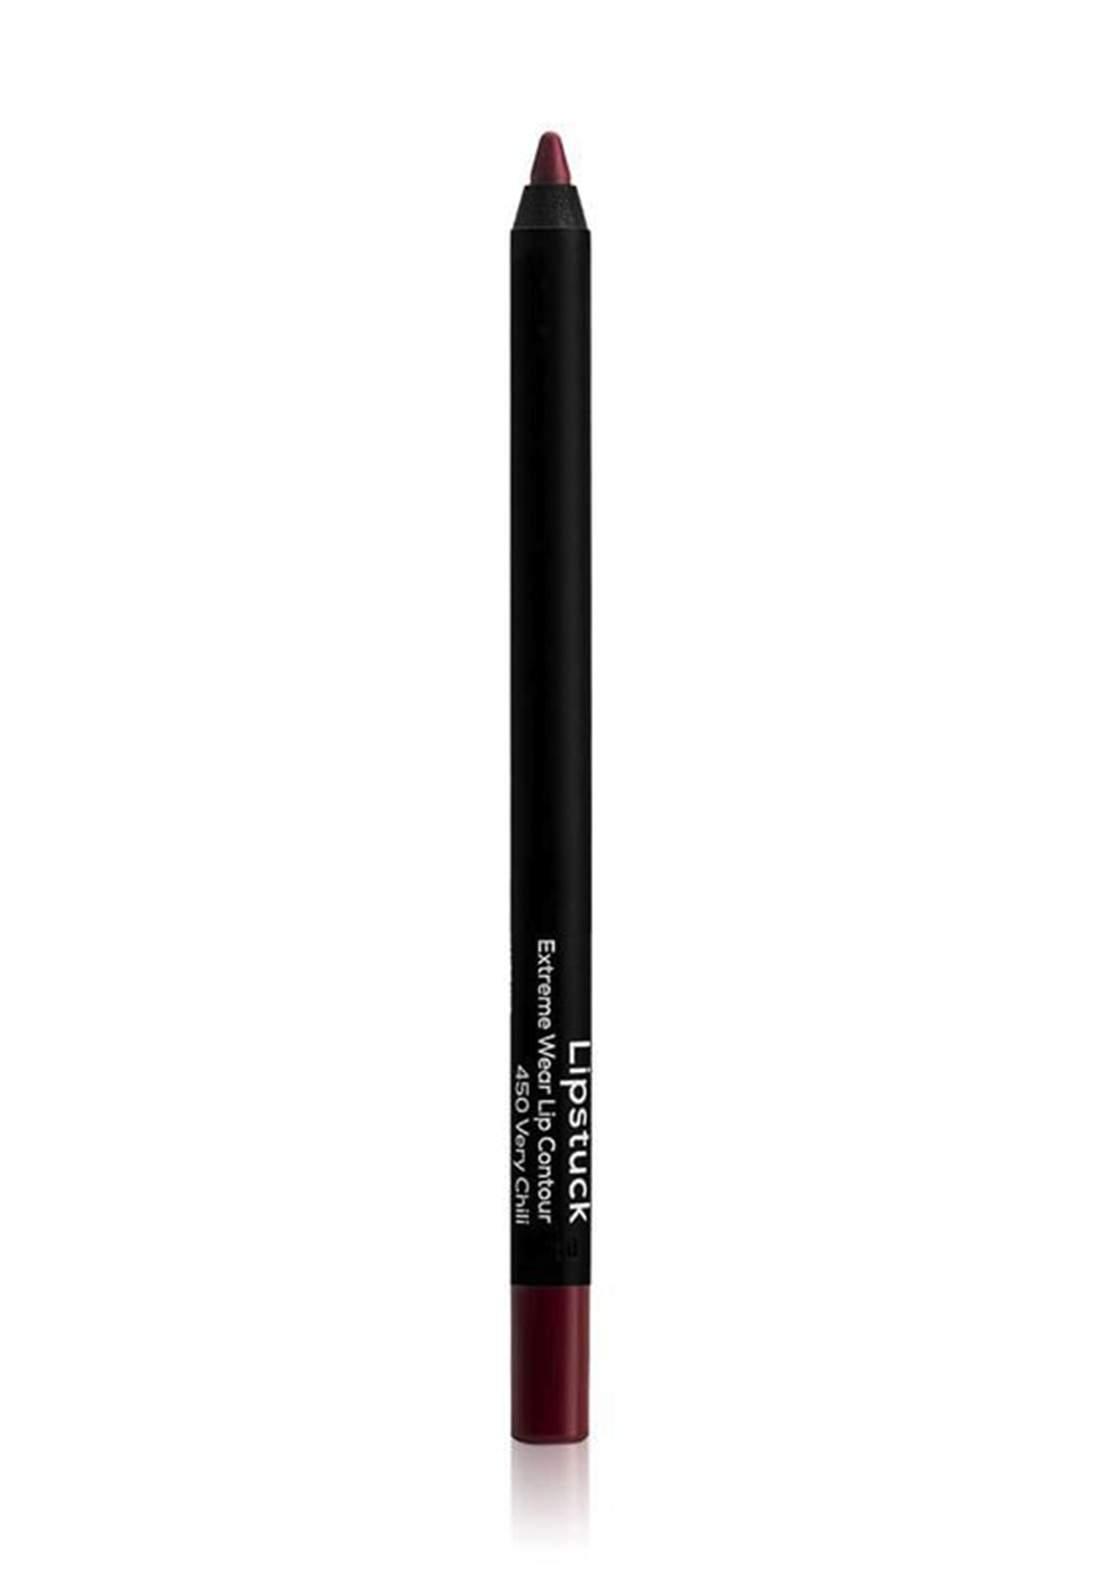 Wow By Wojooh 2522W450 Lipstuck Extreme Wear Lip Contour No.450 Very Chili 1.20g محدد الشفاه